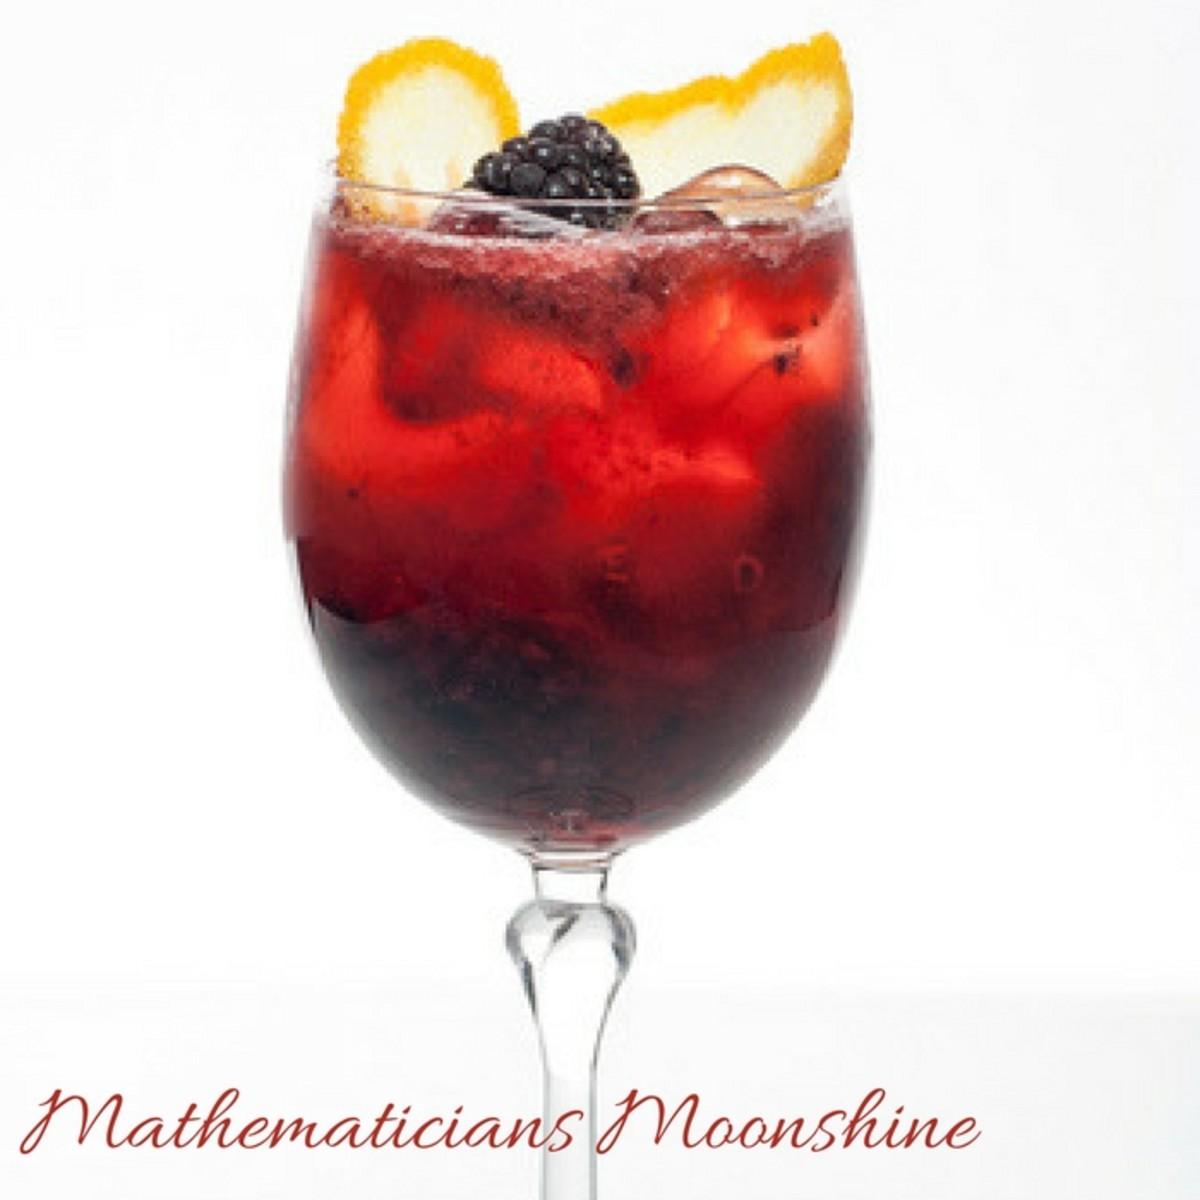 Mathematician Moonshine